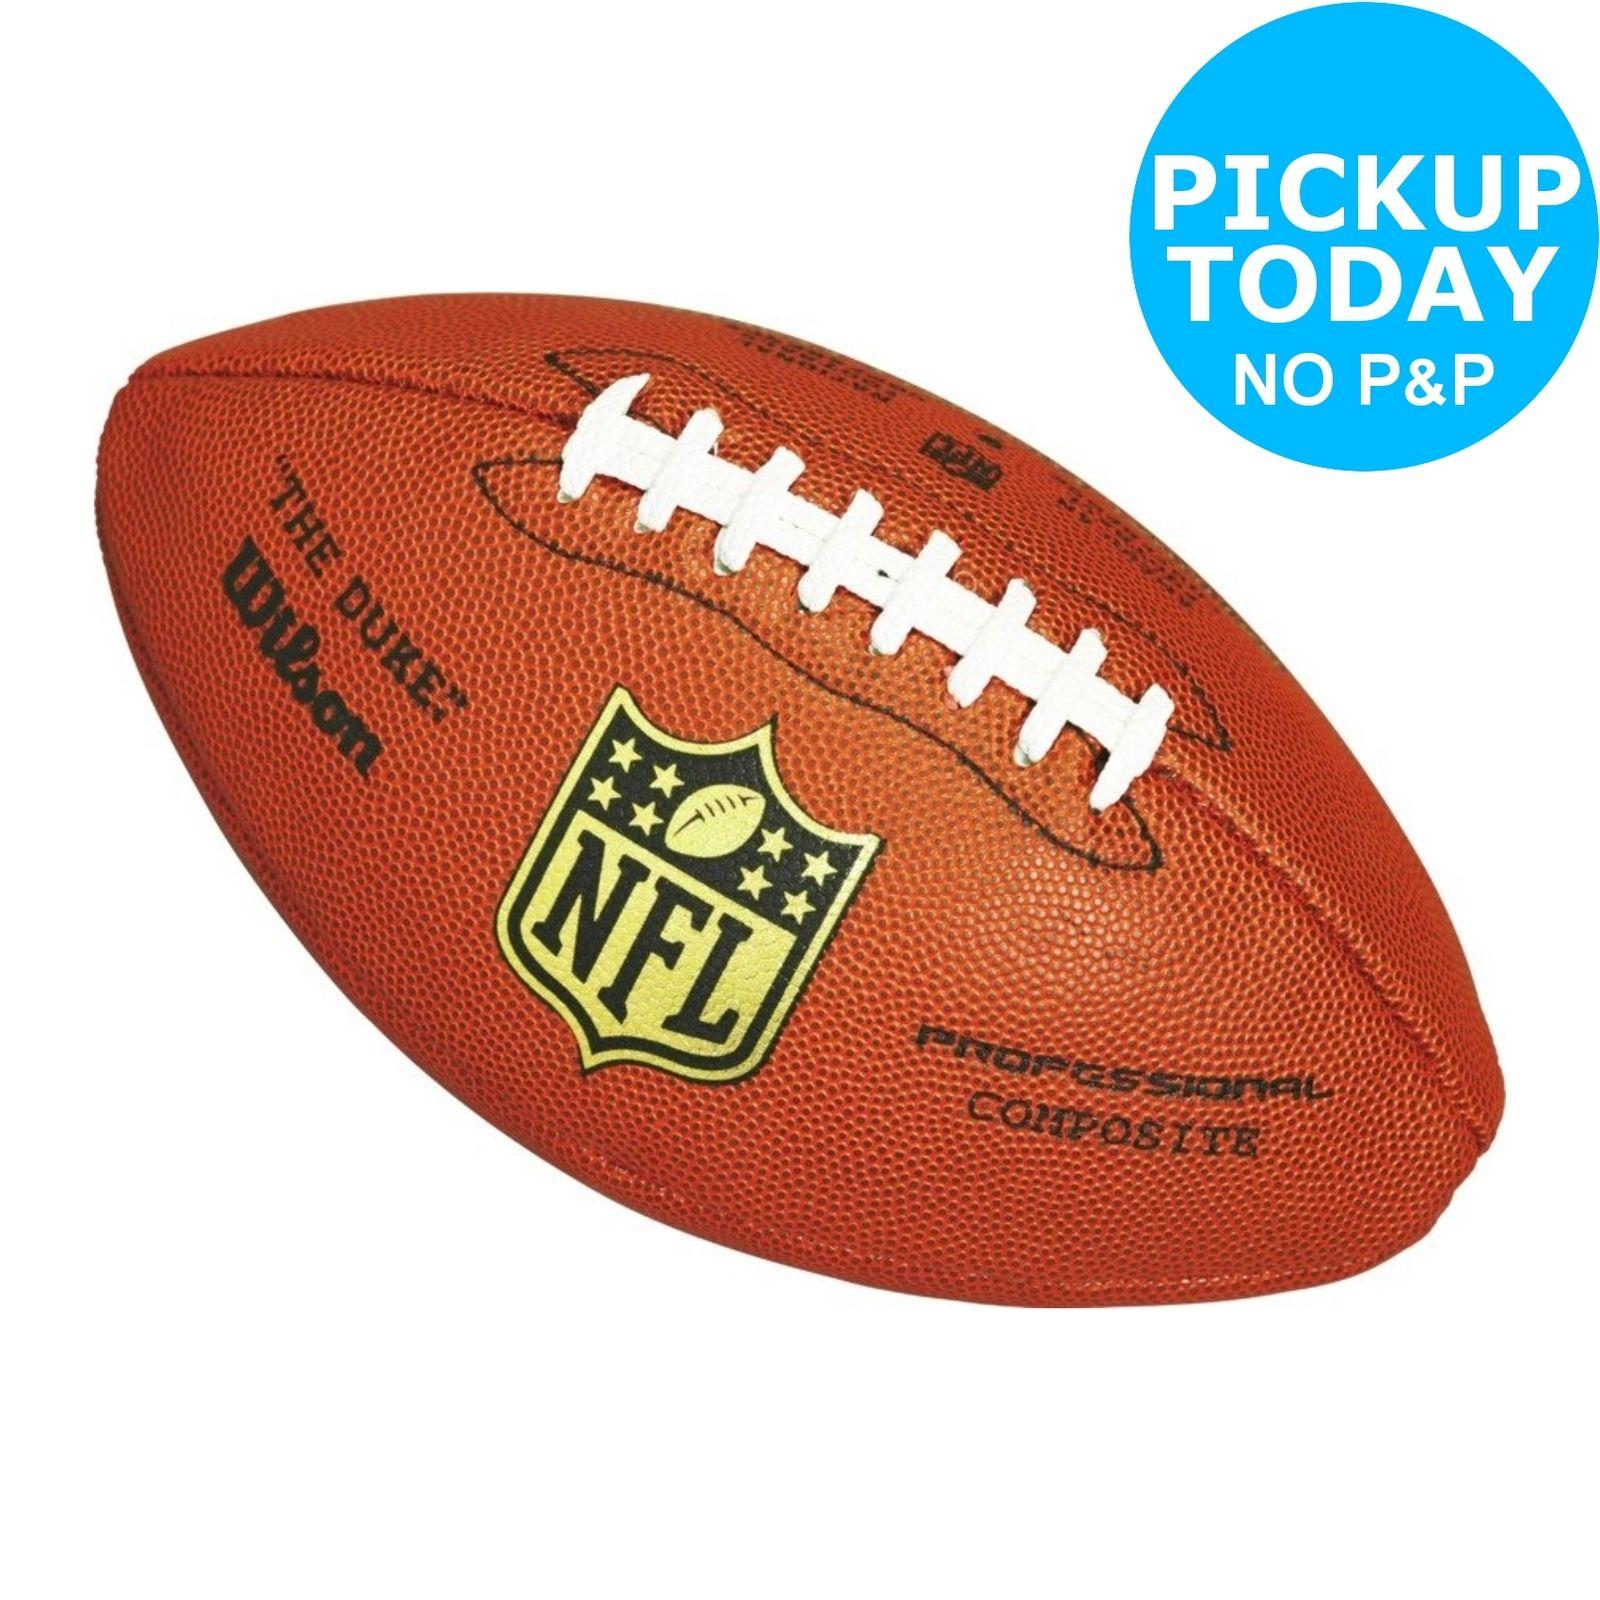 Wilson The Duke Replica NFL American Football - £12.99 + Free C&C @ Argos eBay